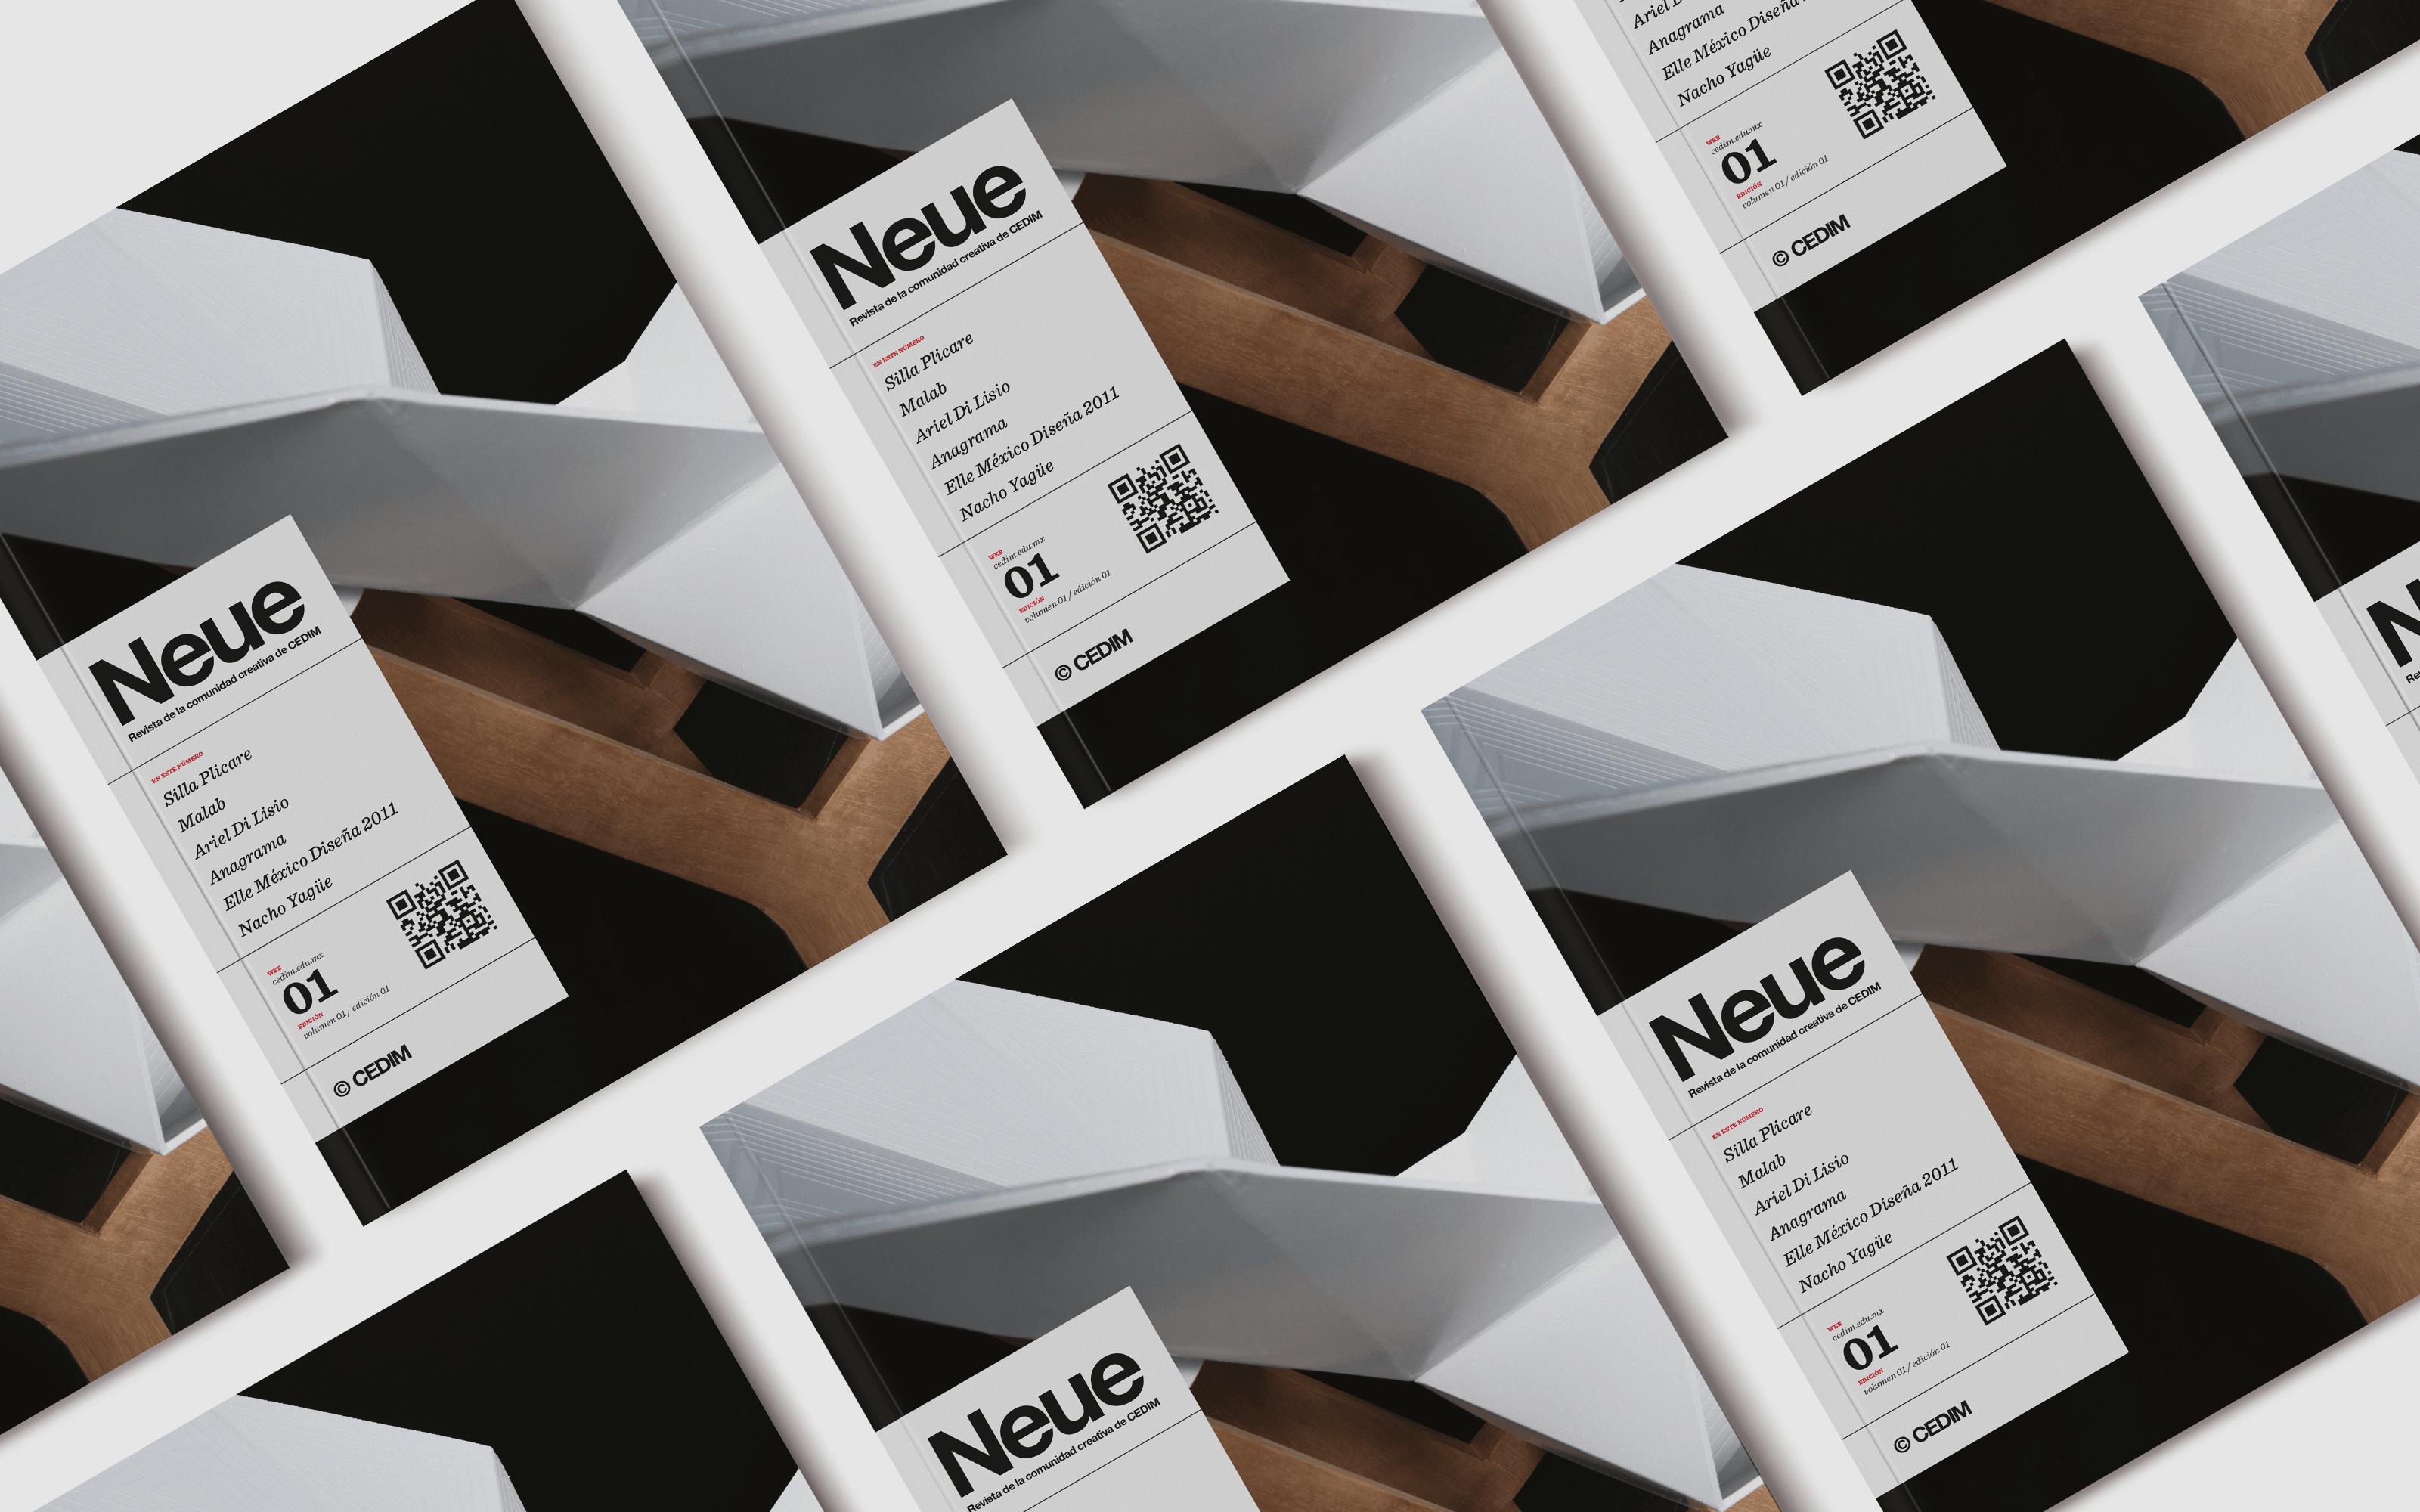 cover-pattern-neue-magazine-cedim-yoenpaperland-compressor